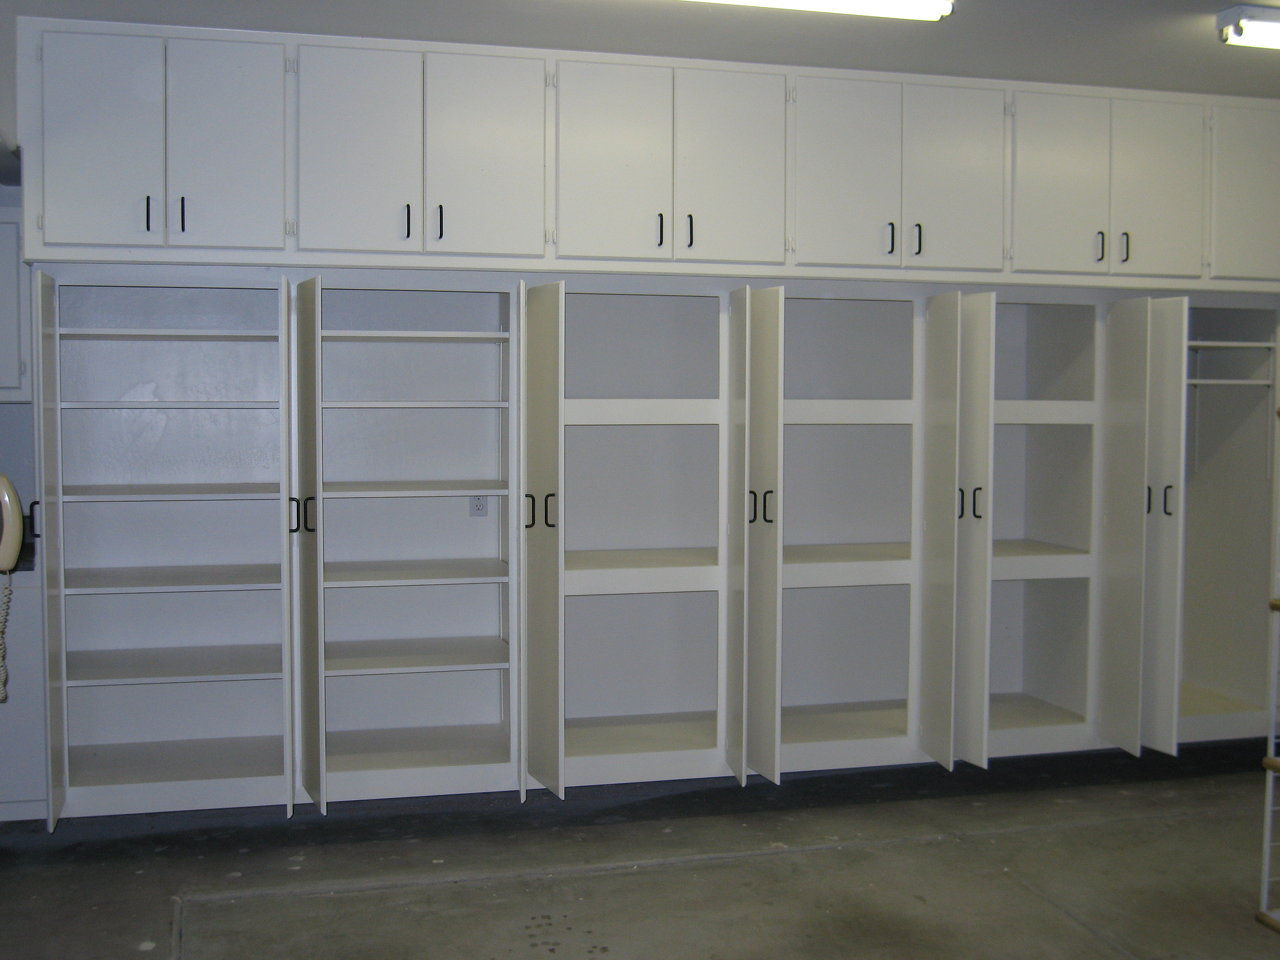 Garage Cabinets And Epoxy Floor Coatings California